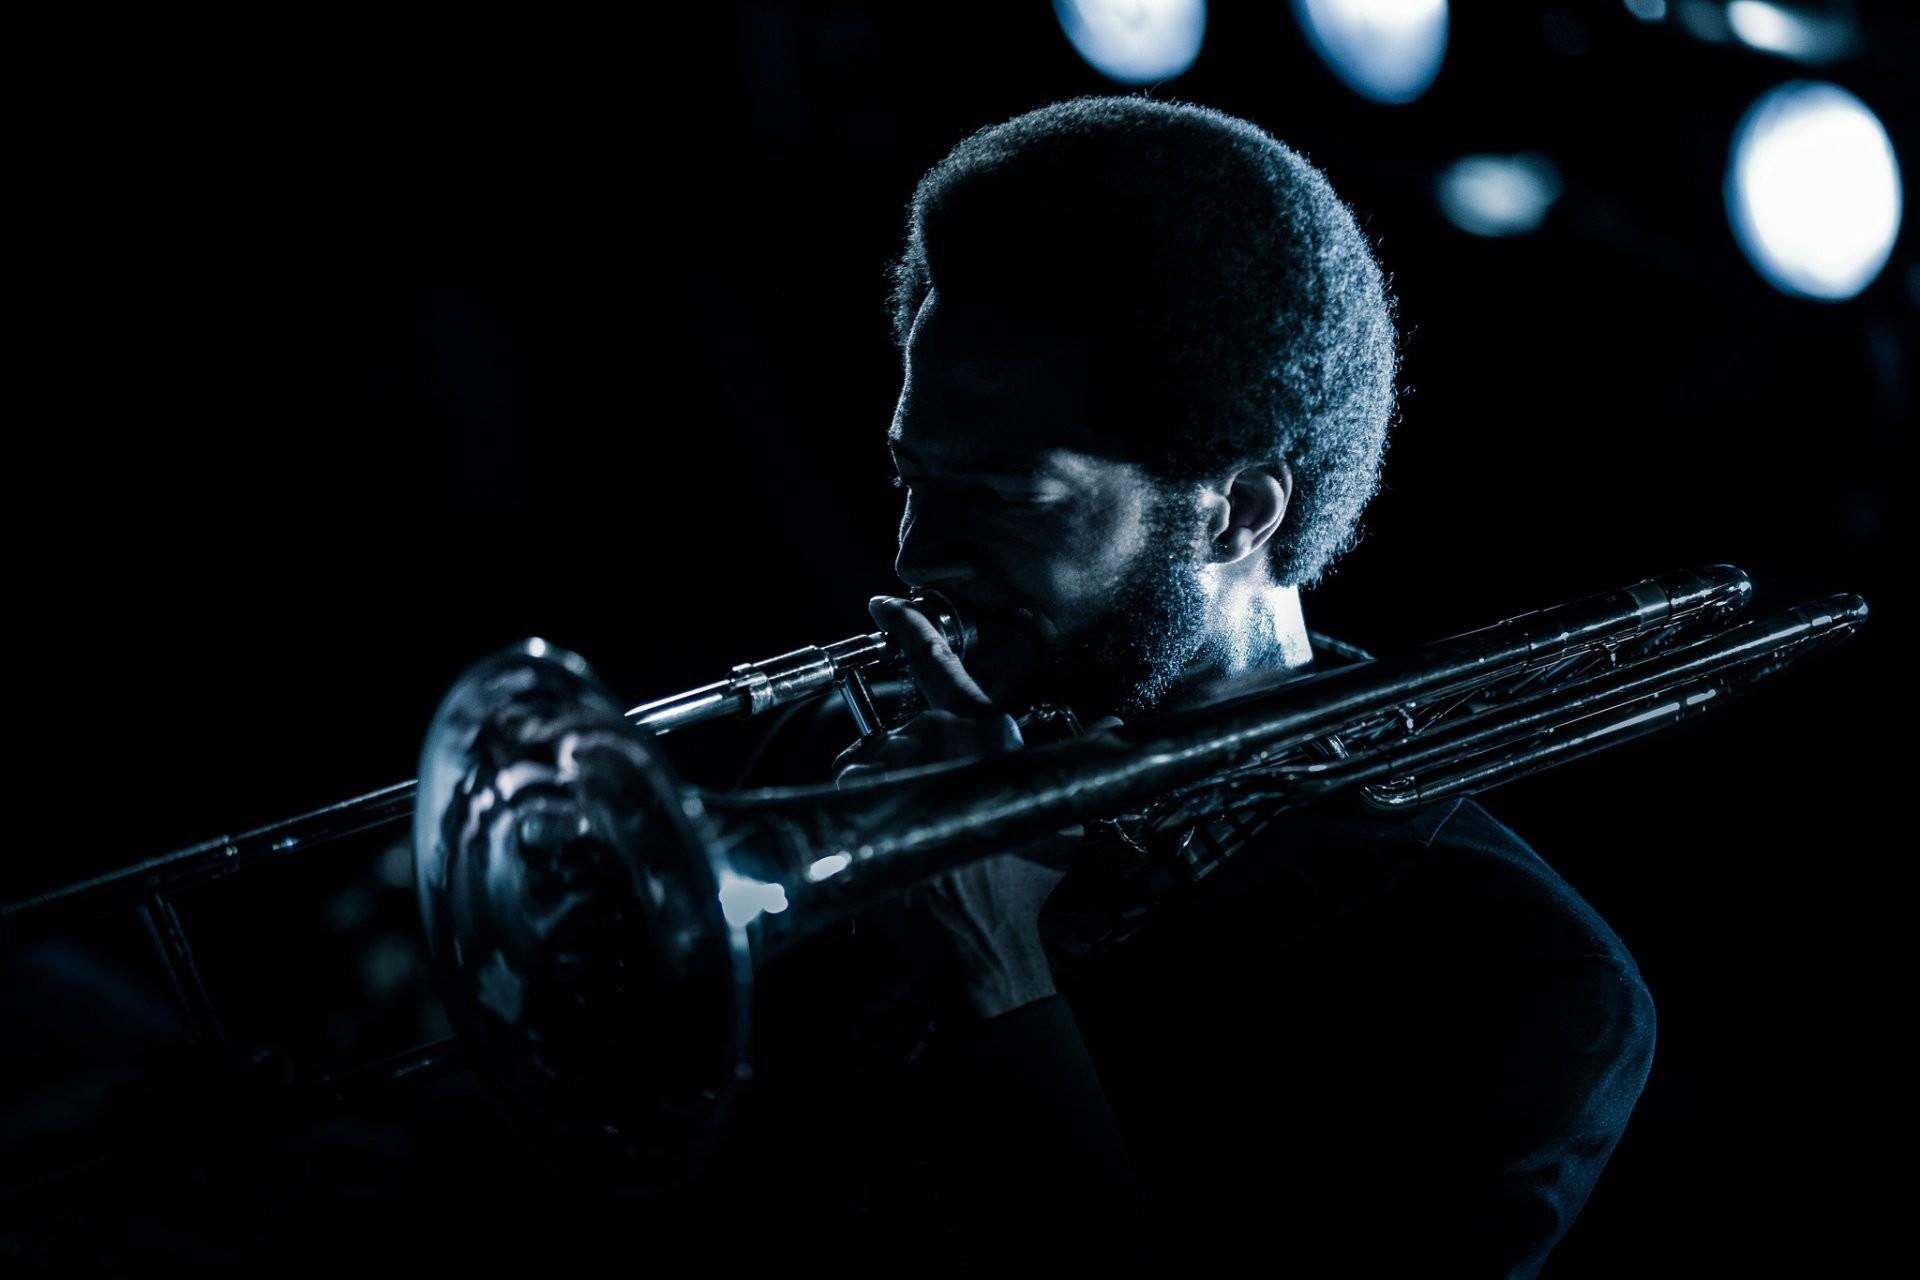 musician music trombone lights night jazz